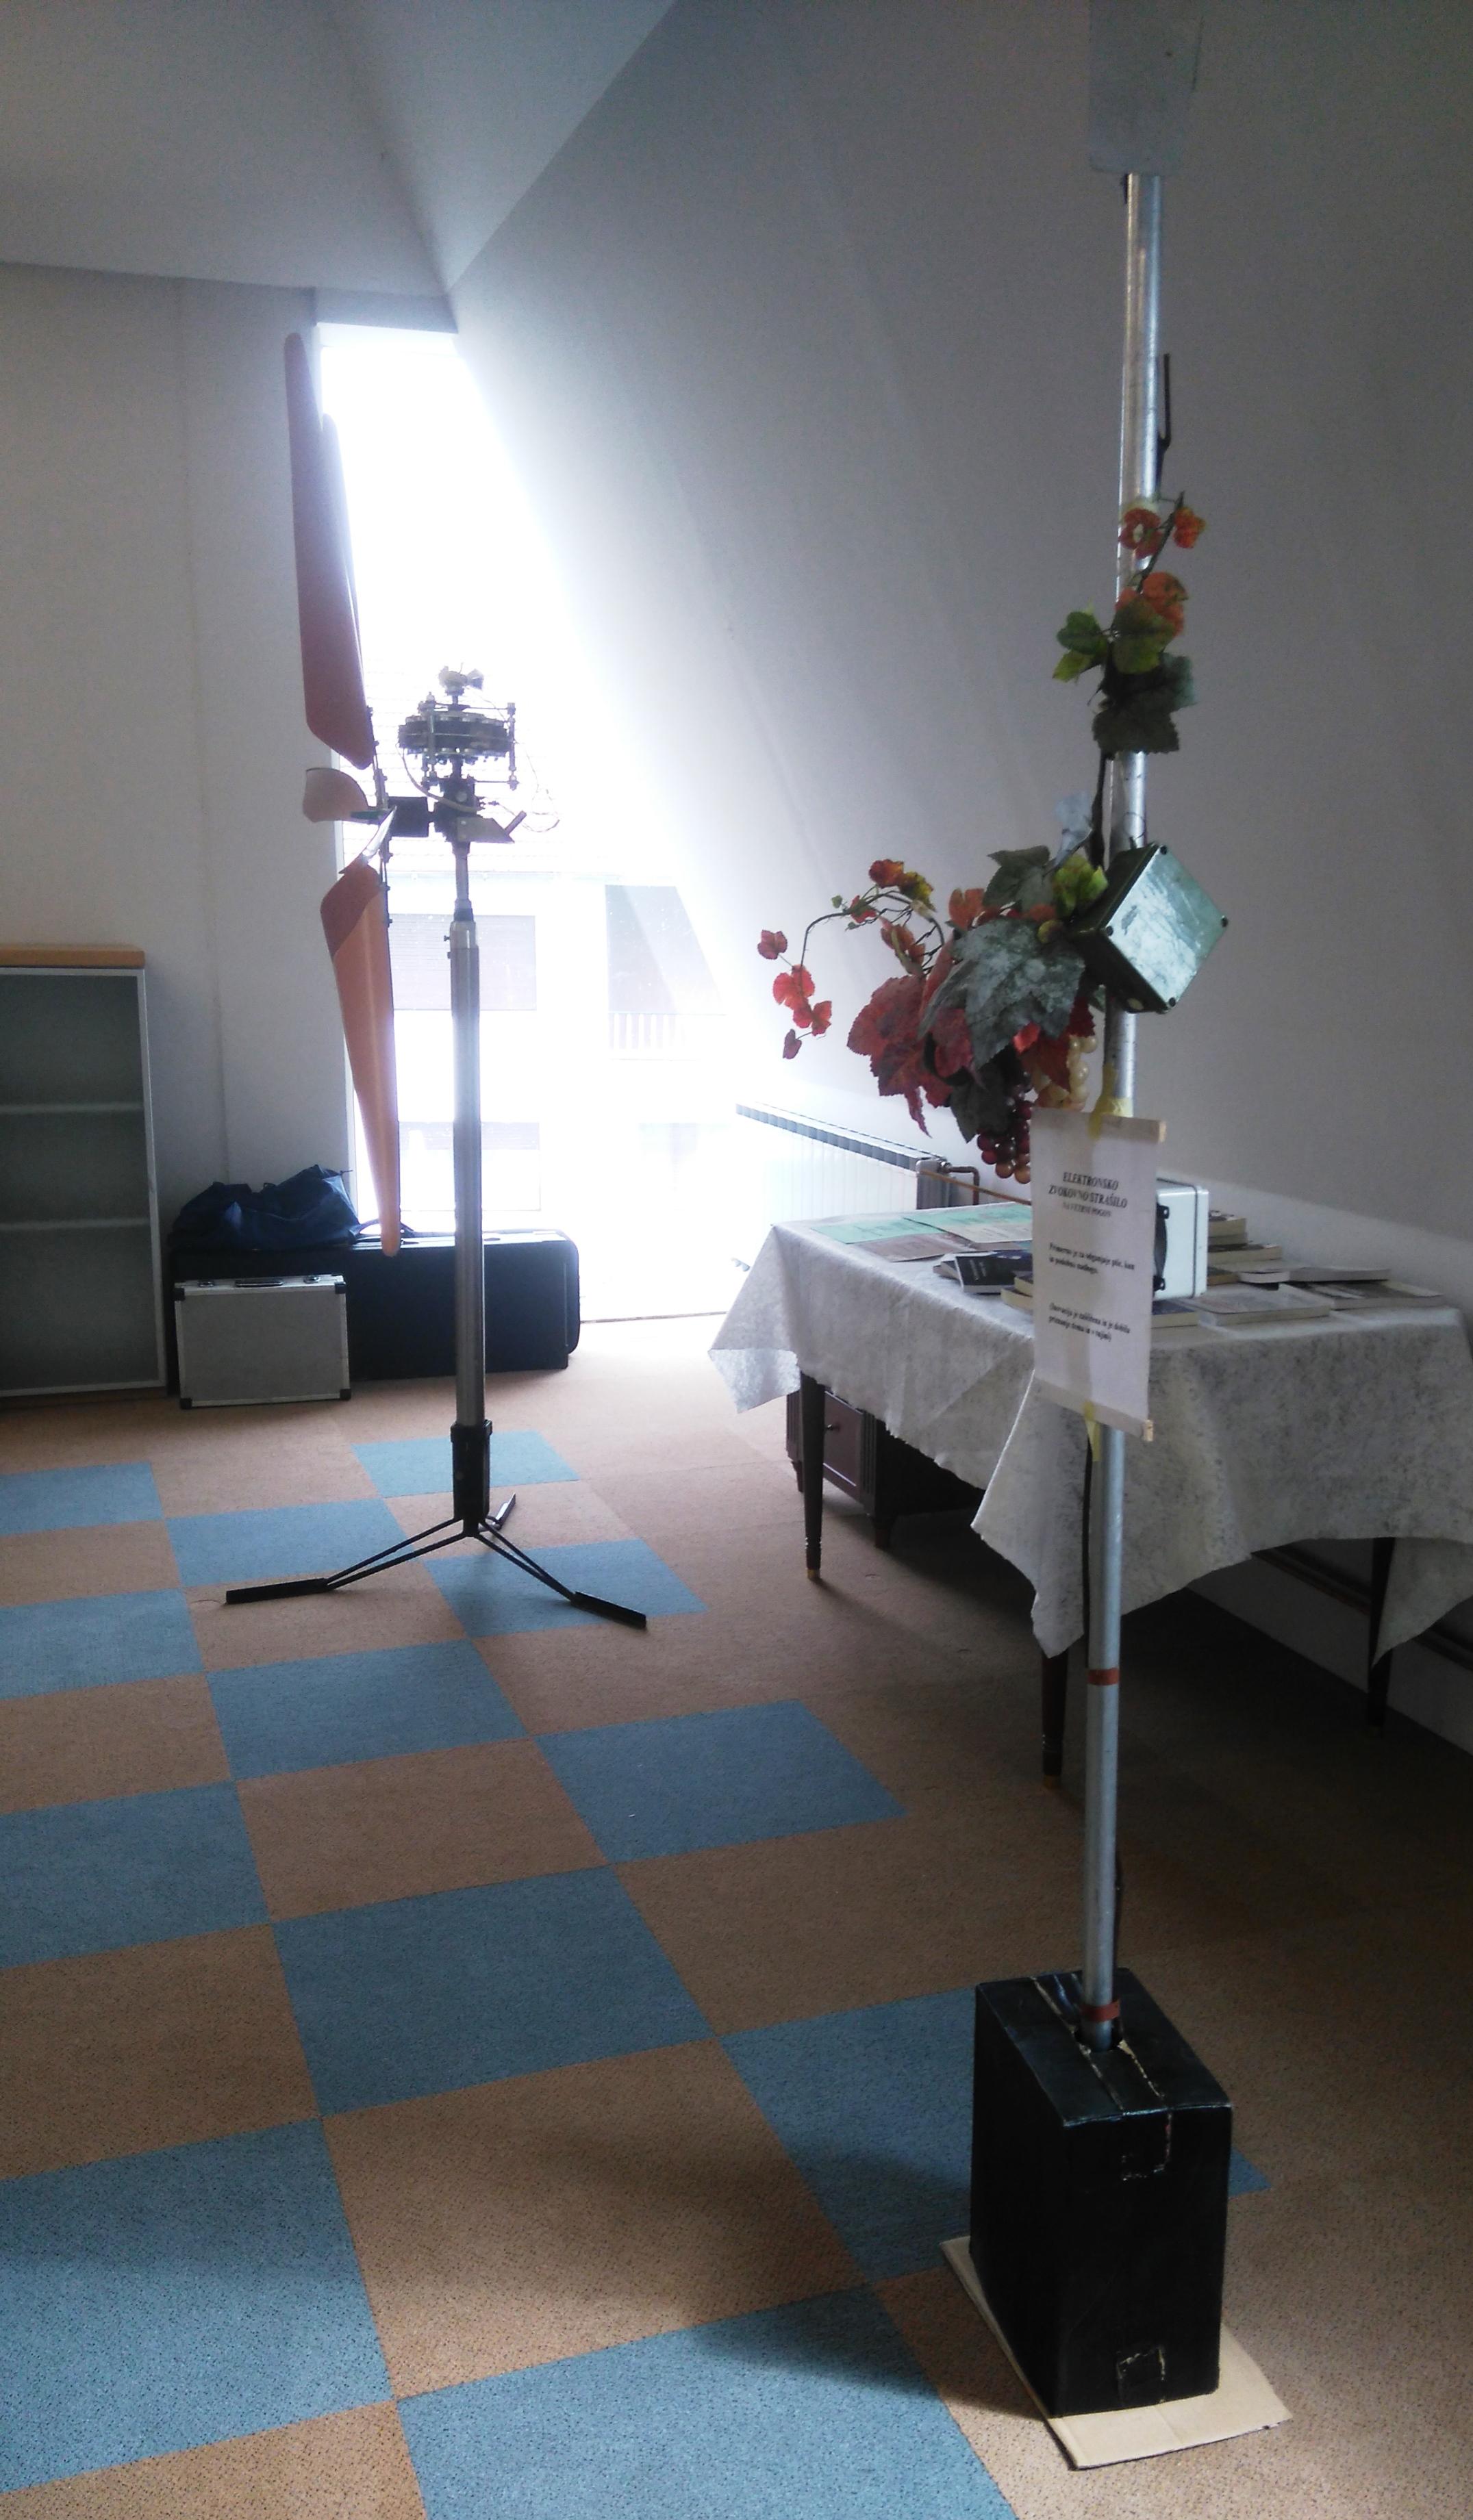 kud-prasila-razstava-rajko-topolovec-2017-helena-srnec-13